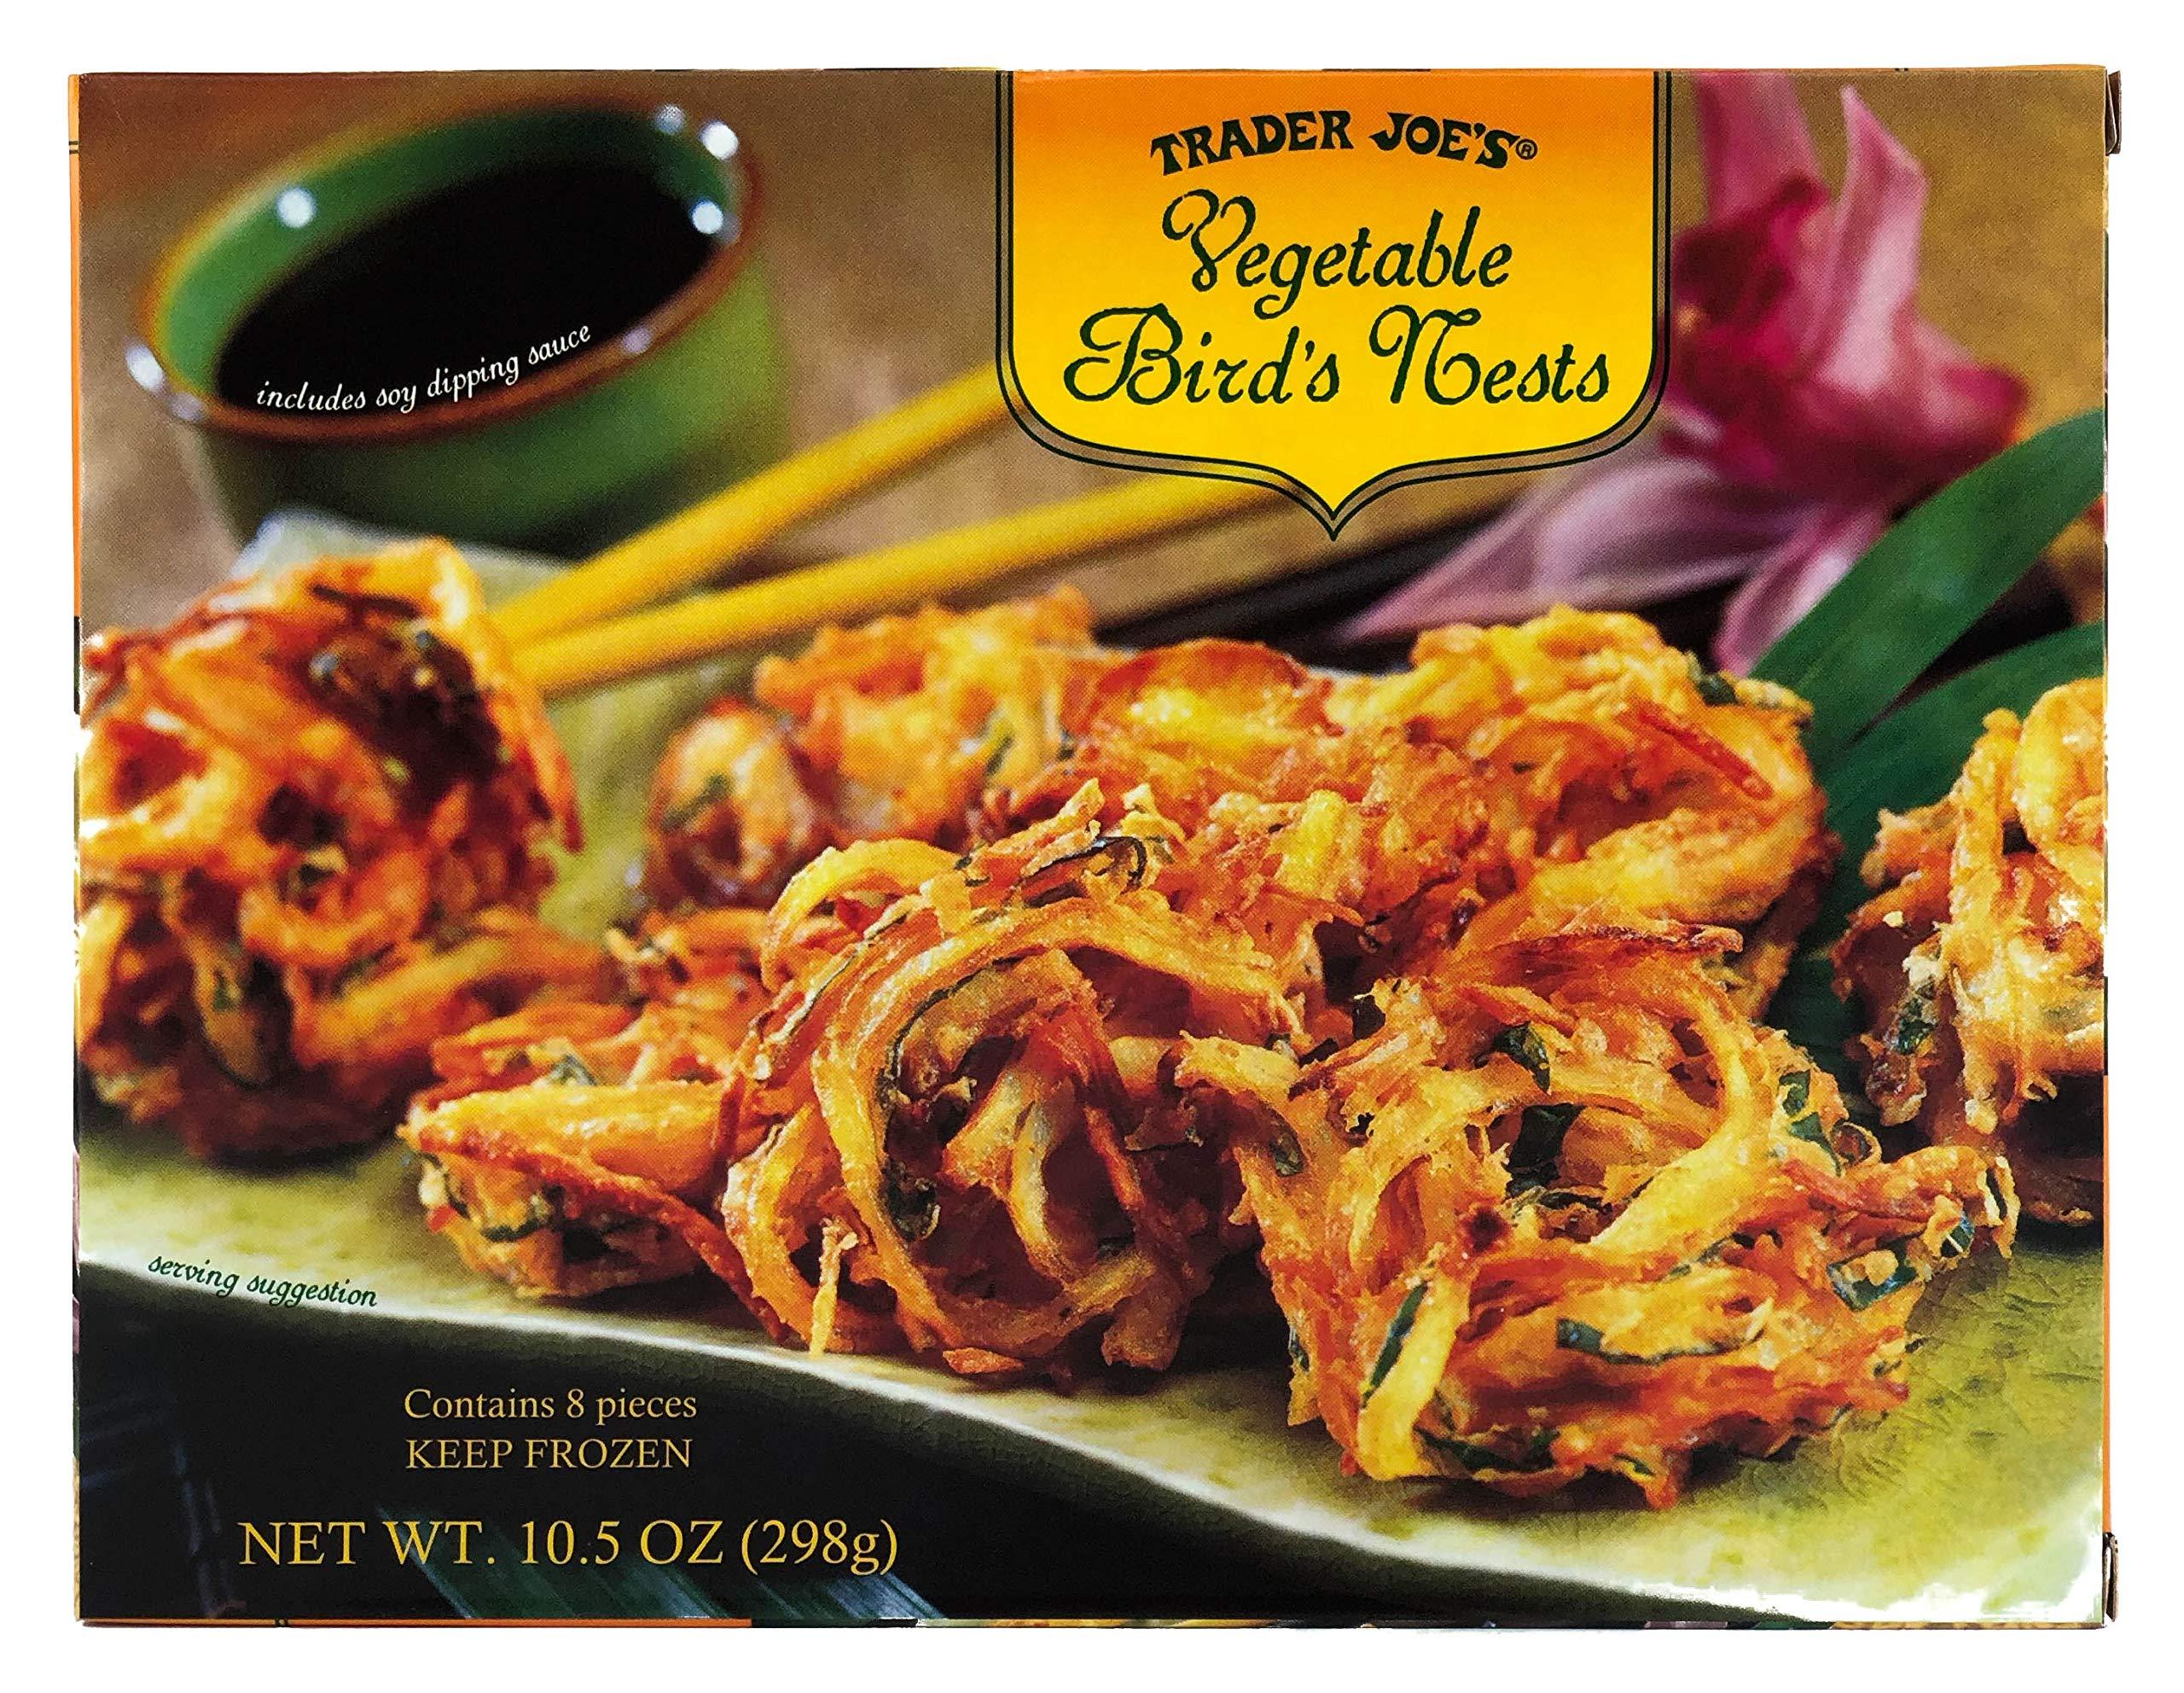 Trader Joe's Vegetable Bird's Nests (6 Pack)